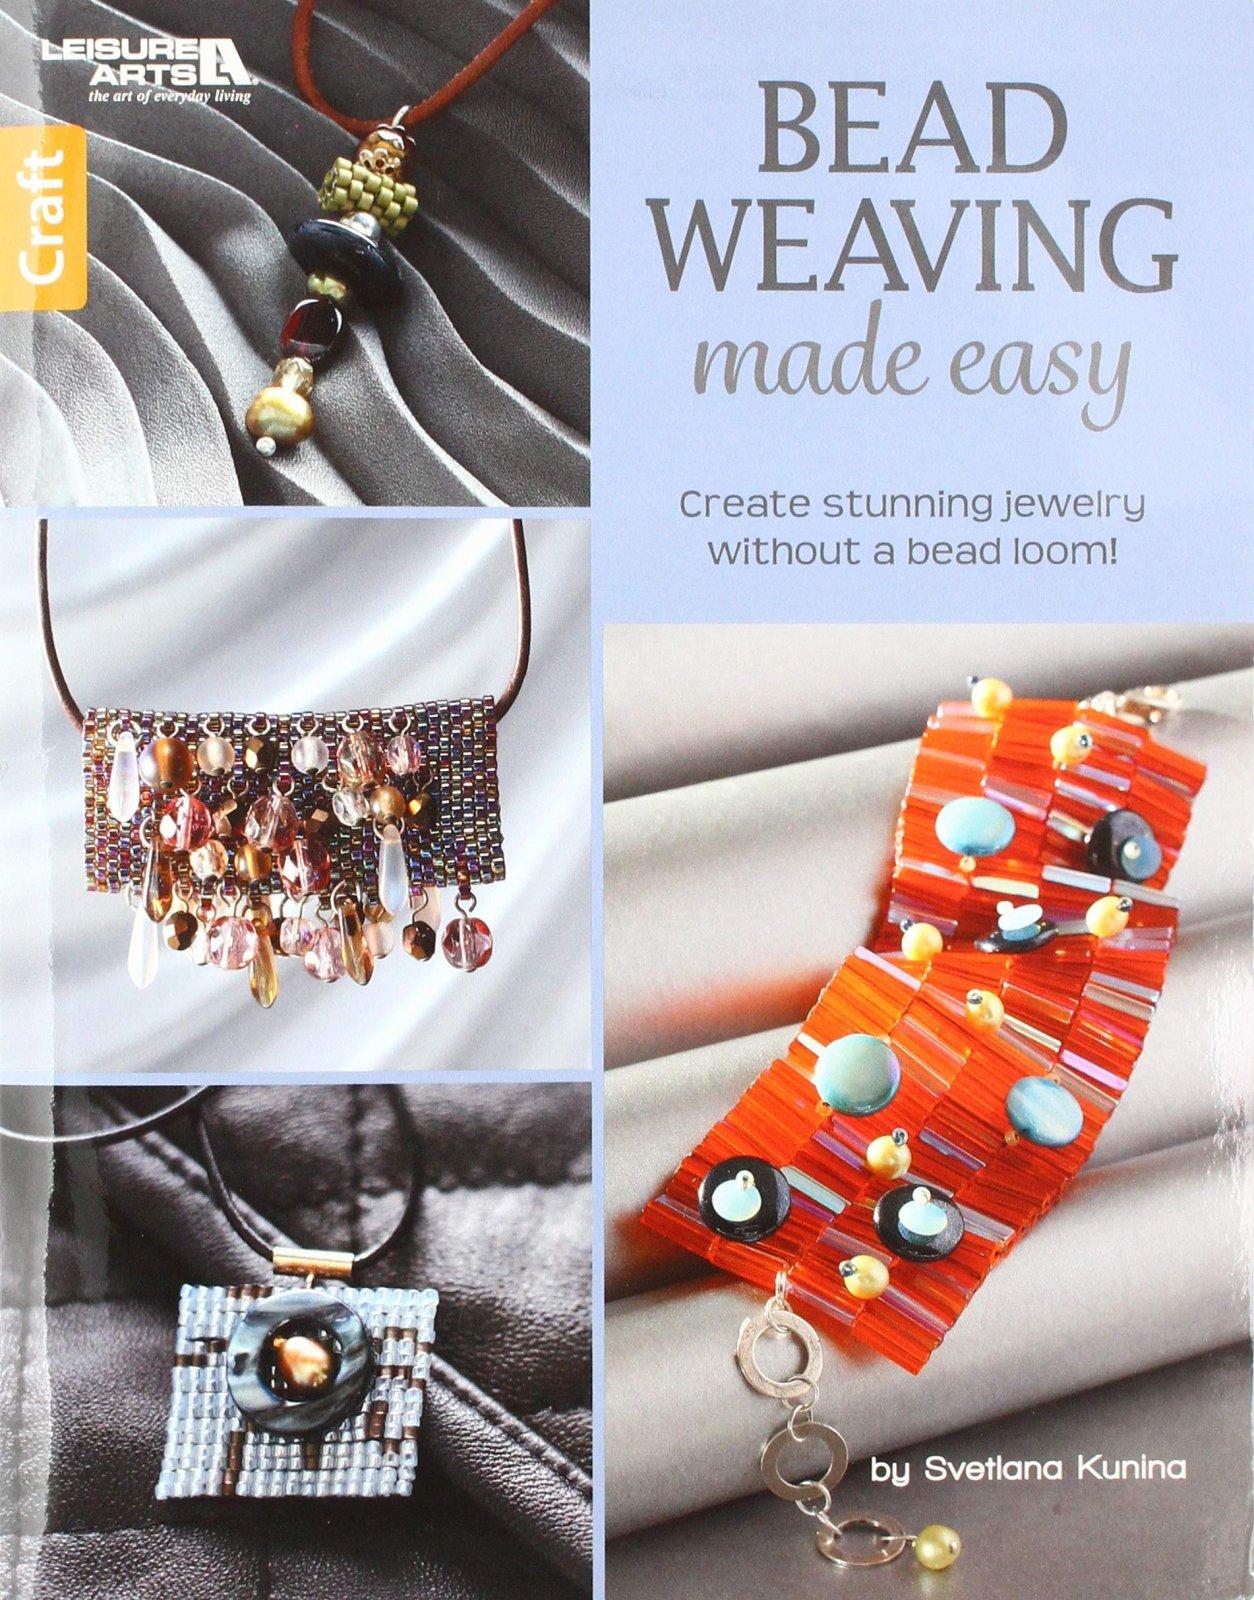 Bead Weaving Made Easy